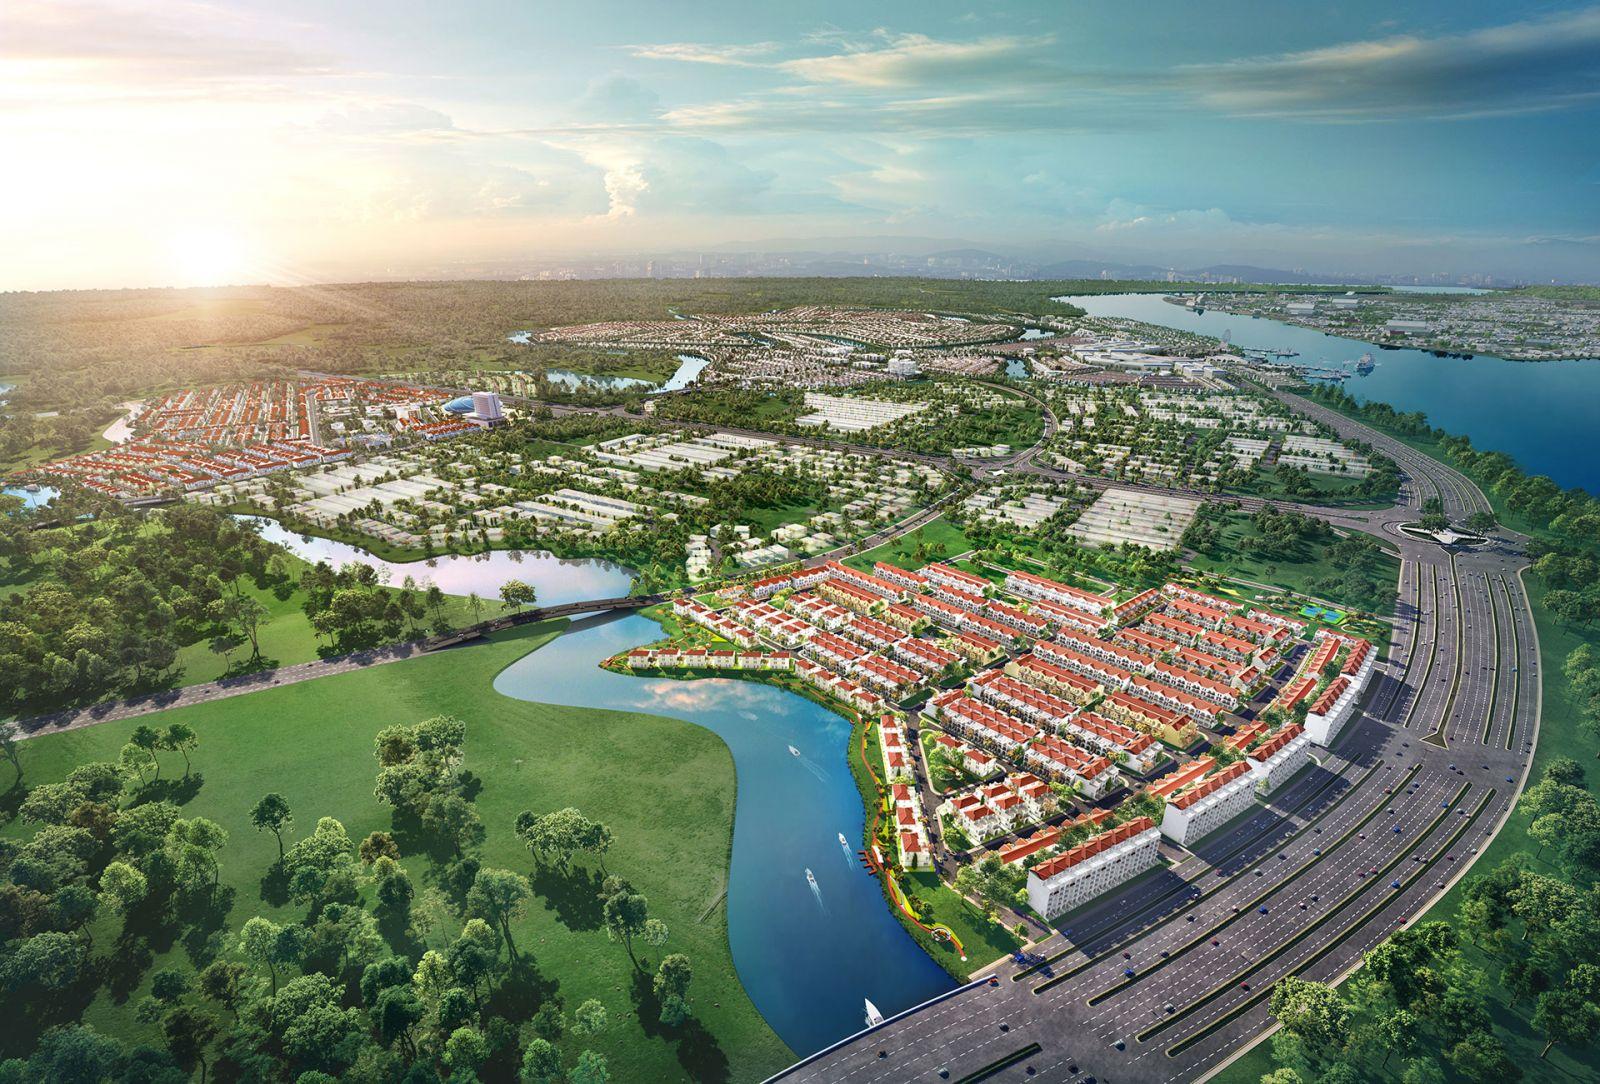 phối cảnh tổng thế aqua city